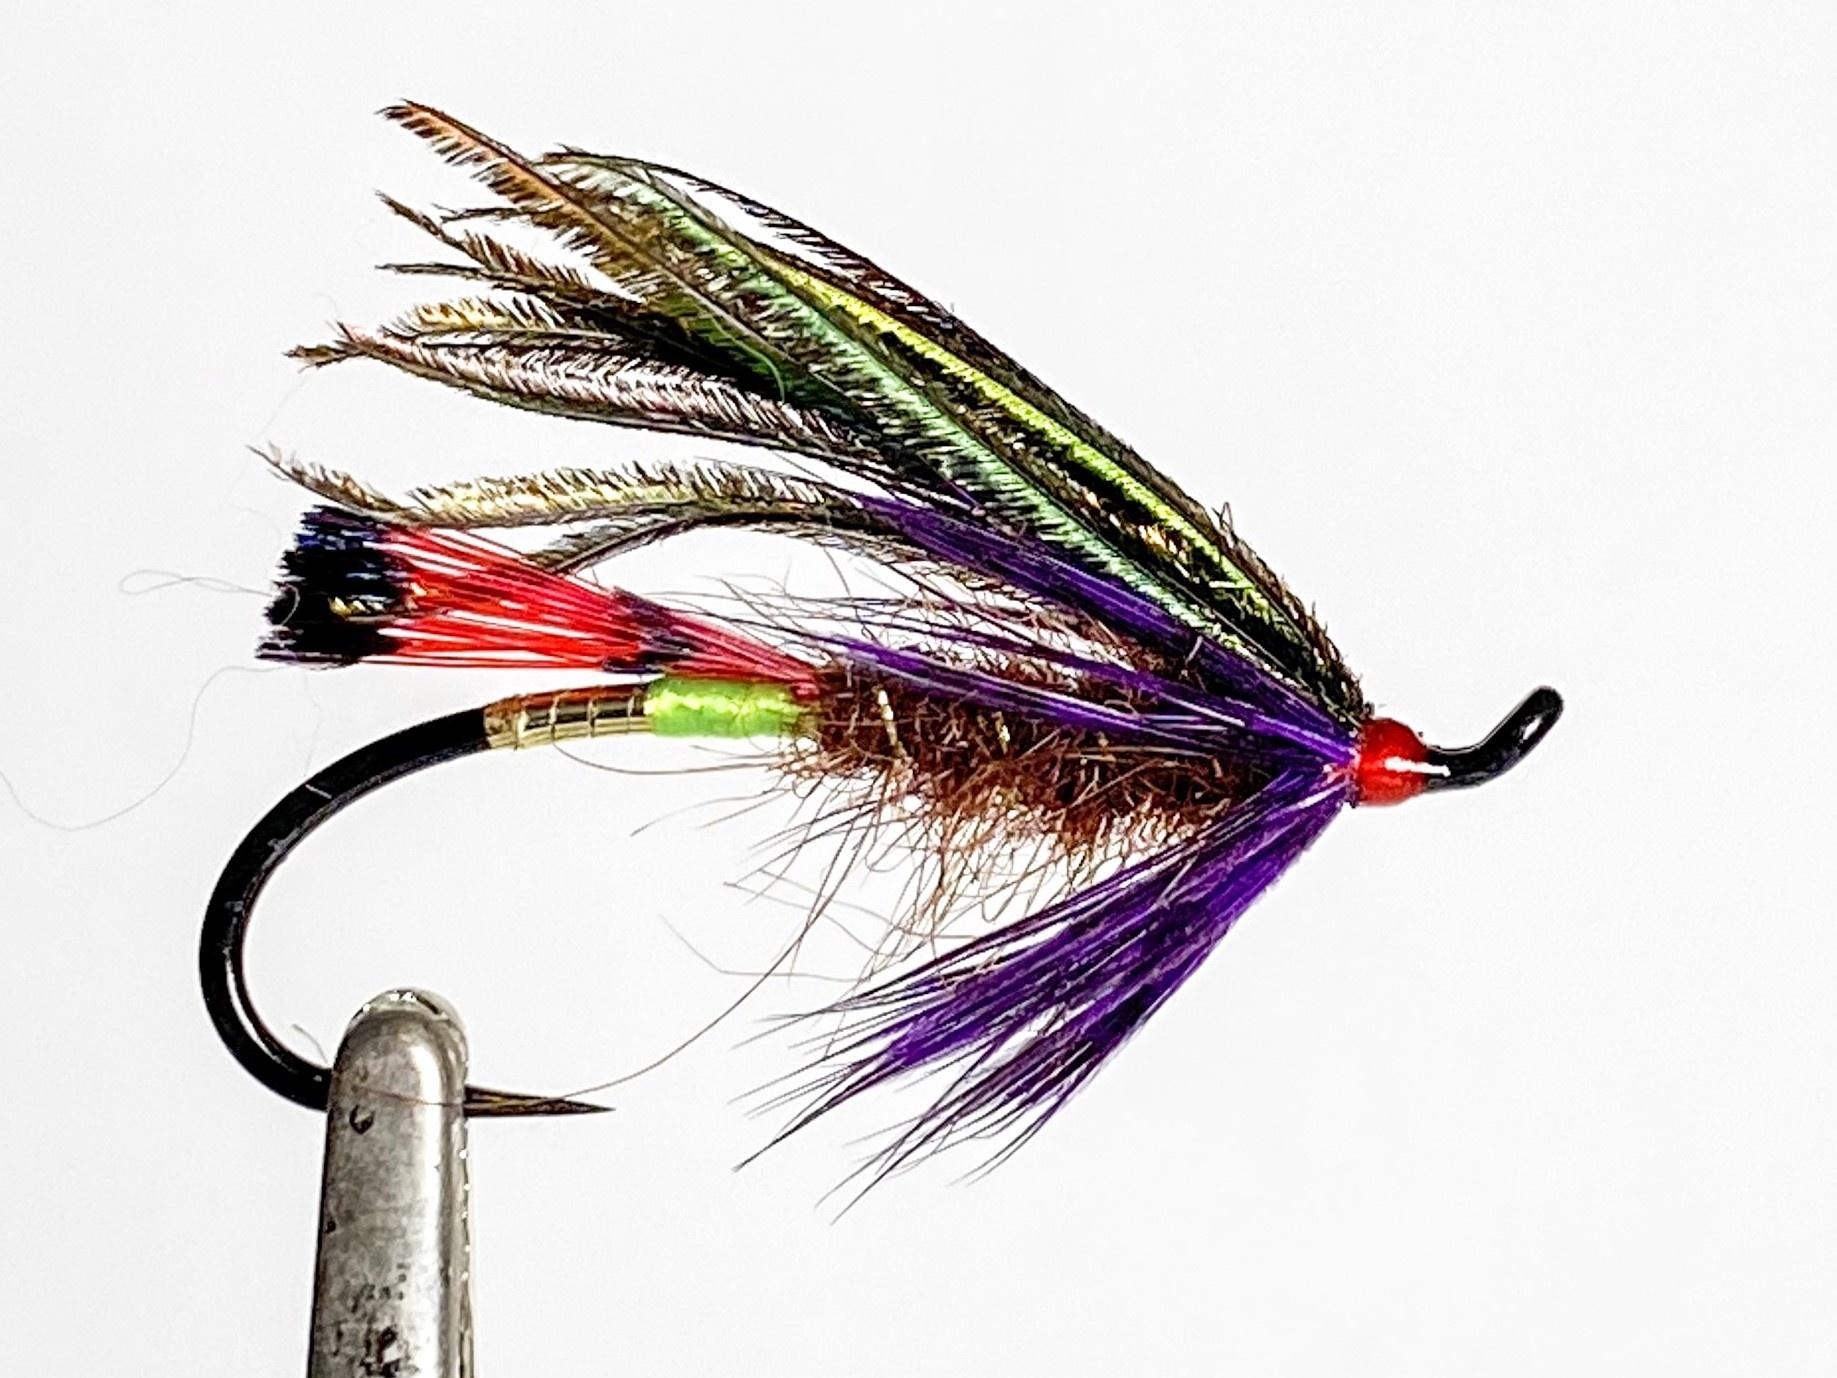 Aqua Flies Hartwick's Sword Fighter Peacock/Purple size 6